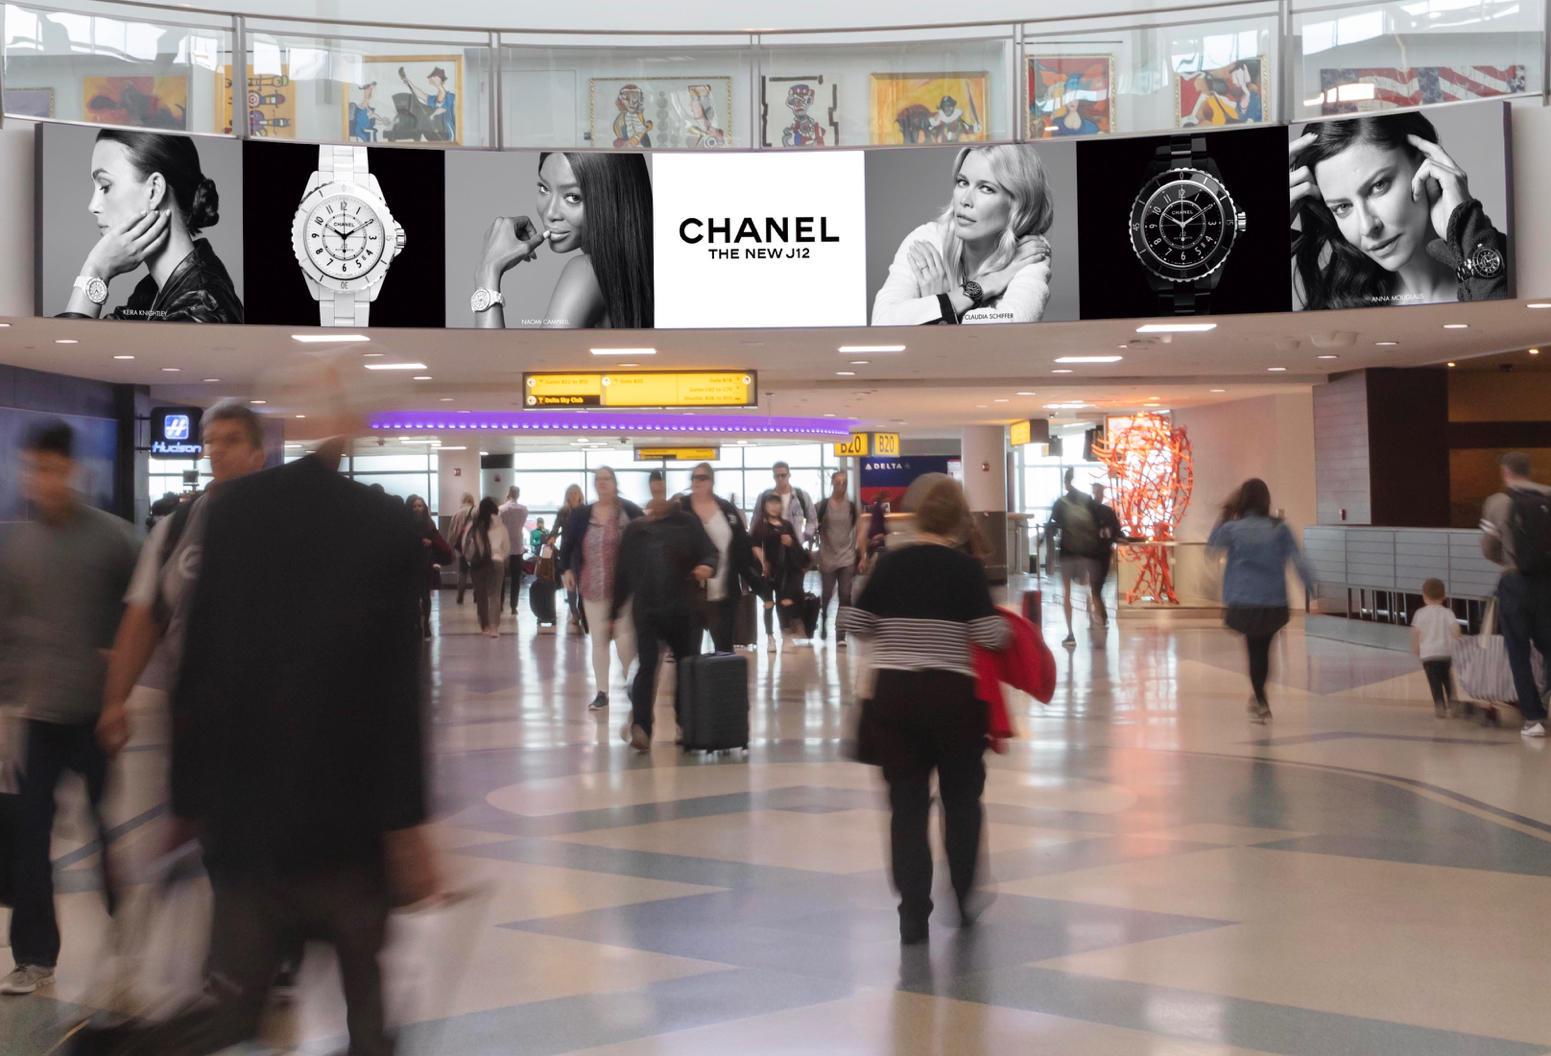 NanoLumens Installations at JFK International's Terminal 4 - Retail News - A1 Retail Magazine - Retail events From A1 Media Magazines